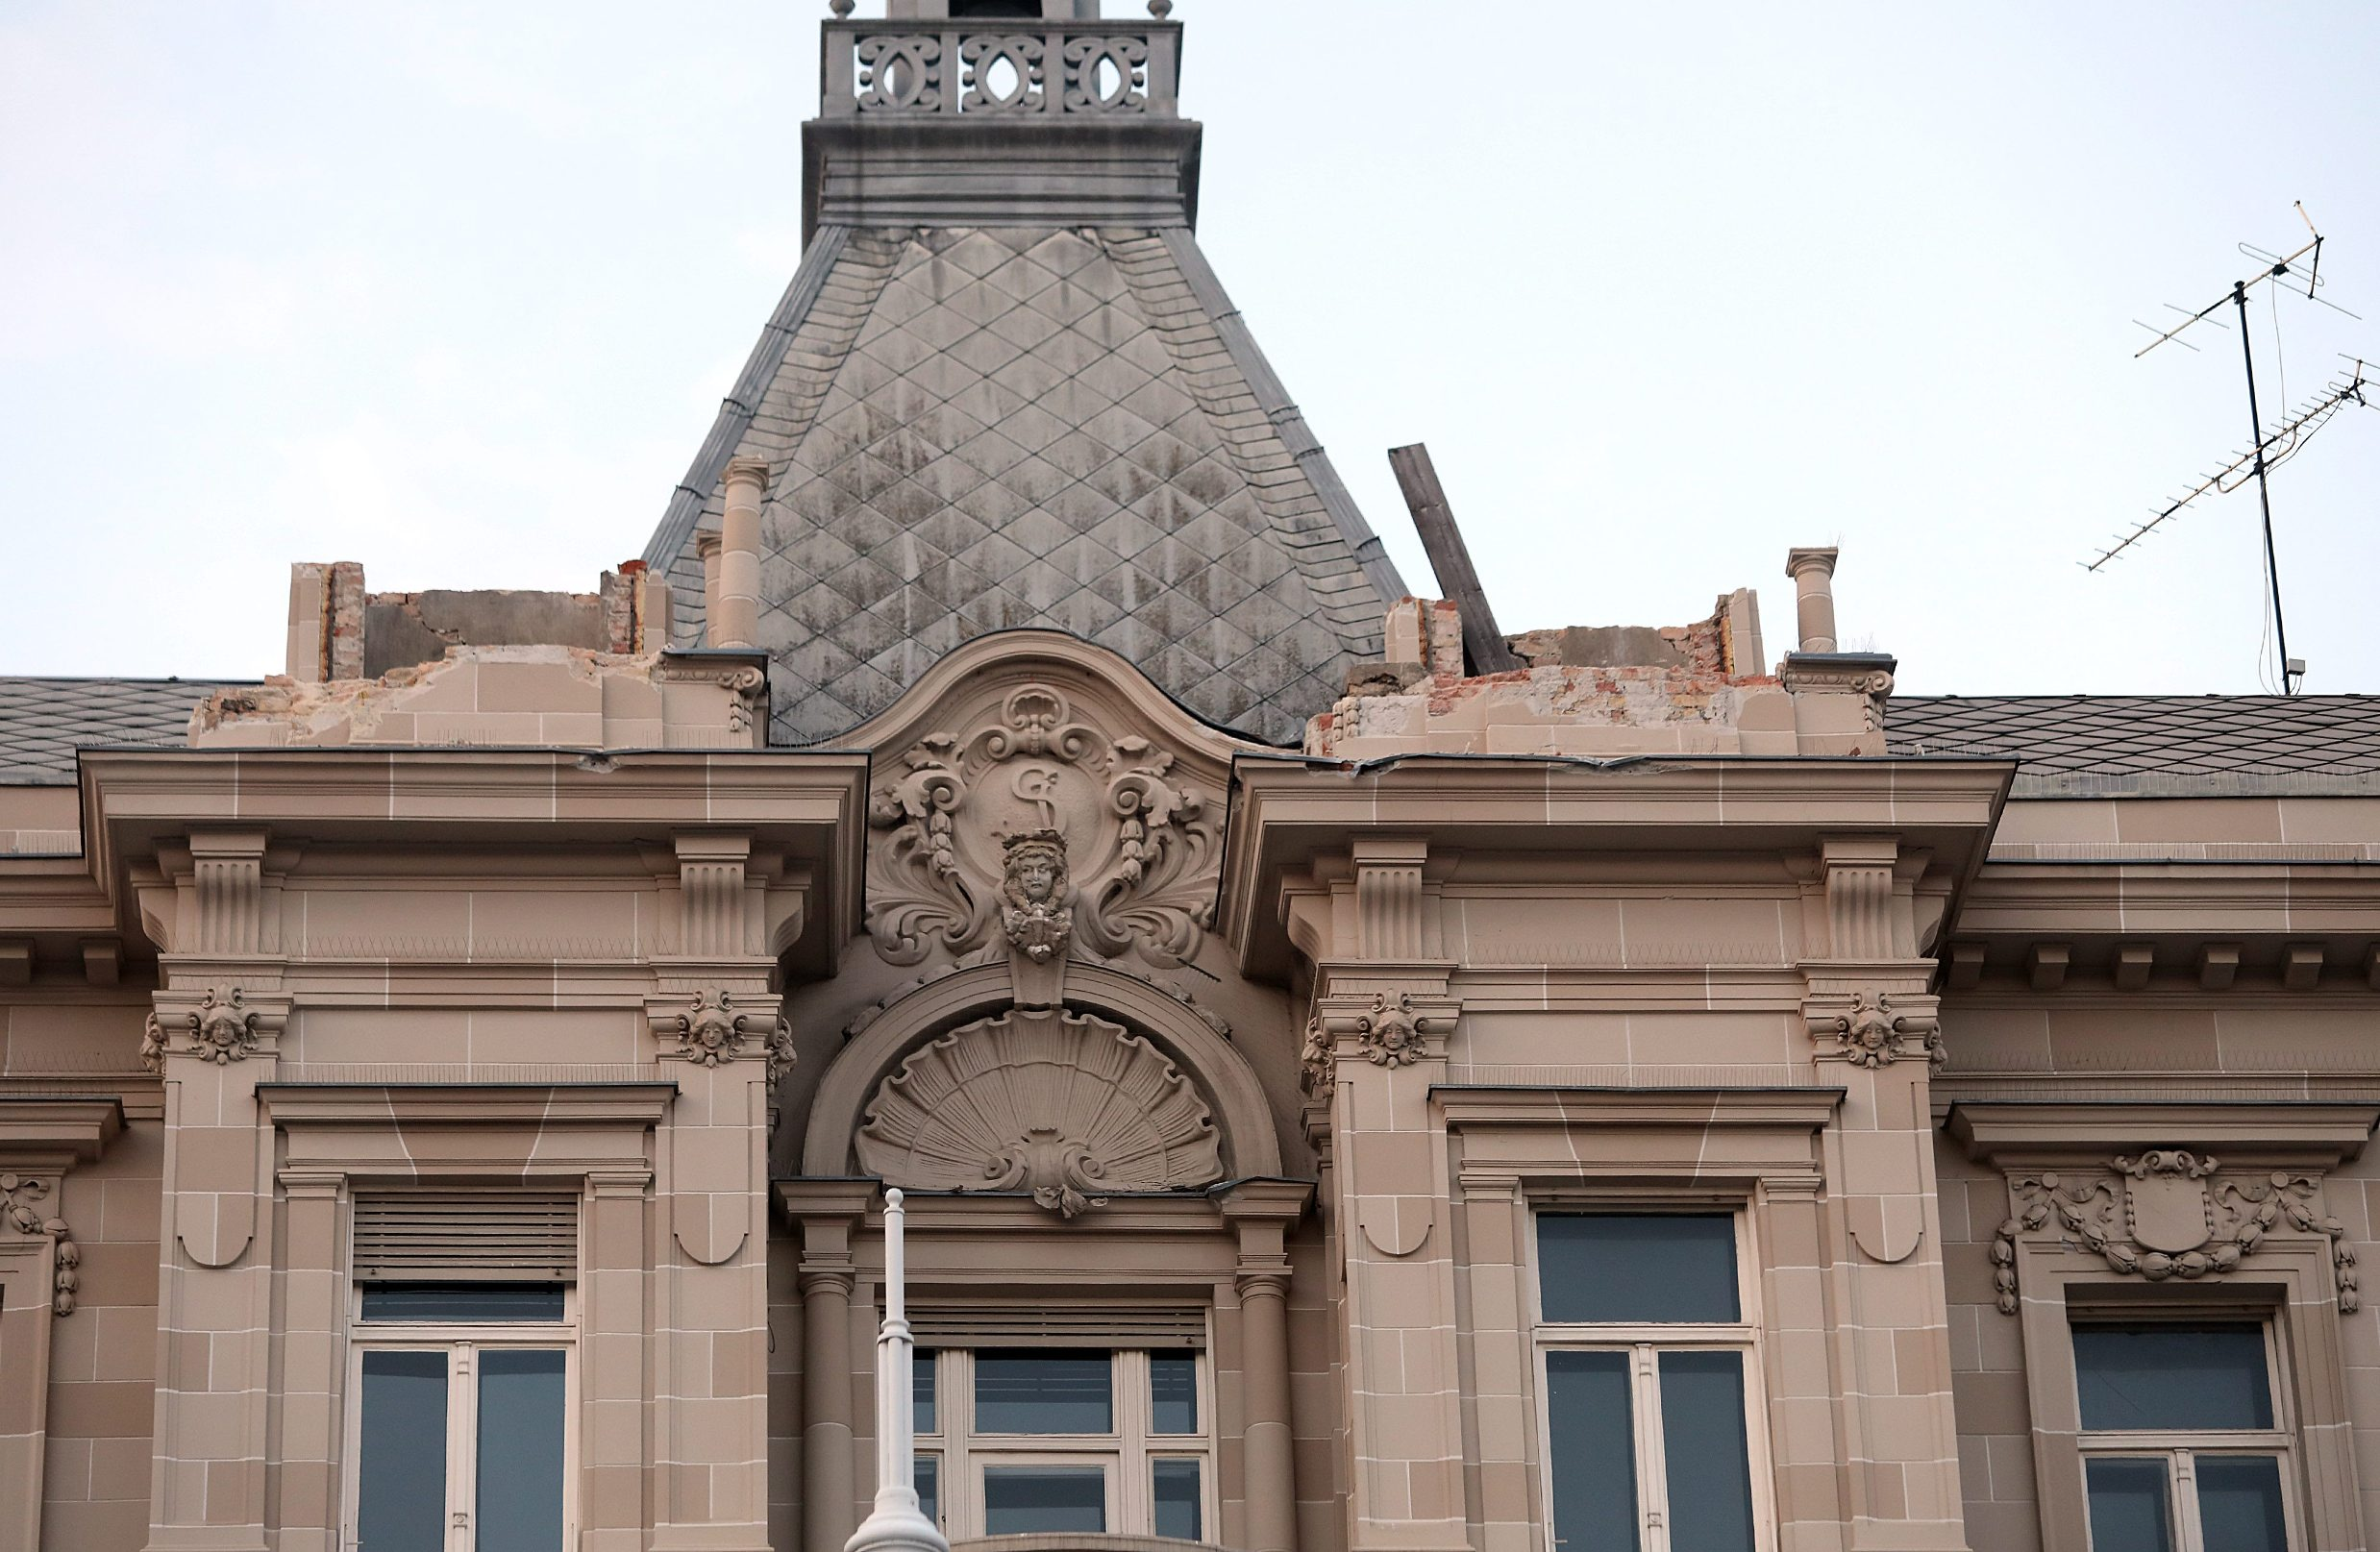 Zagreb, 220320. Trg bana Jelacica. Veliki potres u Zagrebu.  Vatrogasci srusili kupolu na vrhu zgrade koja je stradala u potresu.  Na fotografiji: zgrada bez kupola. Foto: Rank Suvar / CROPIX